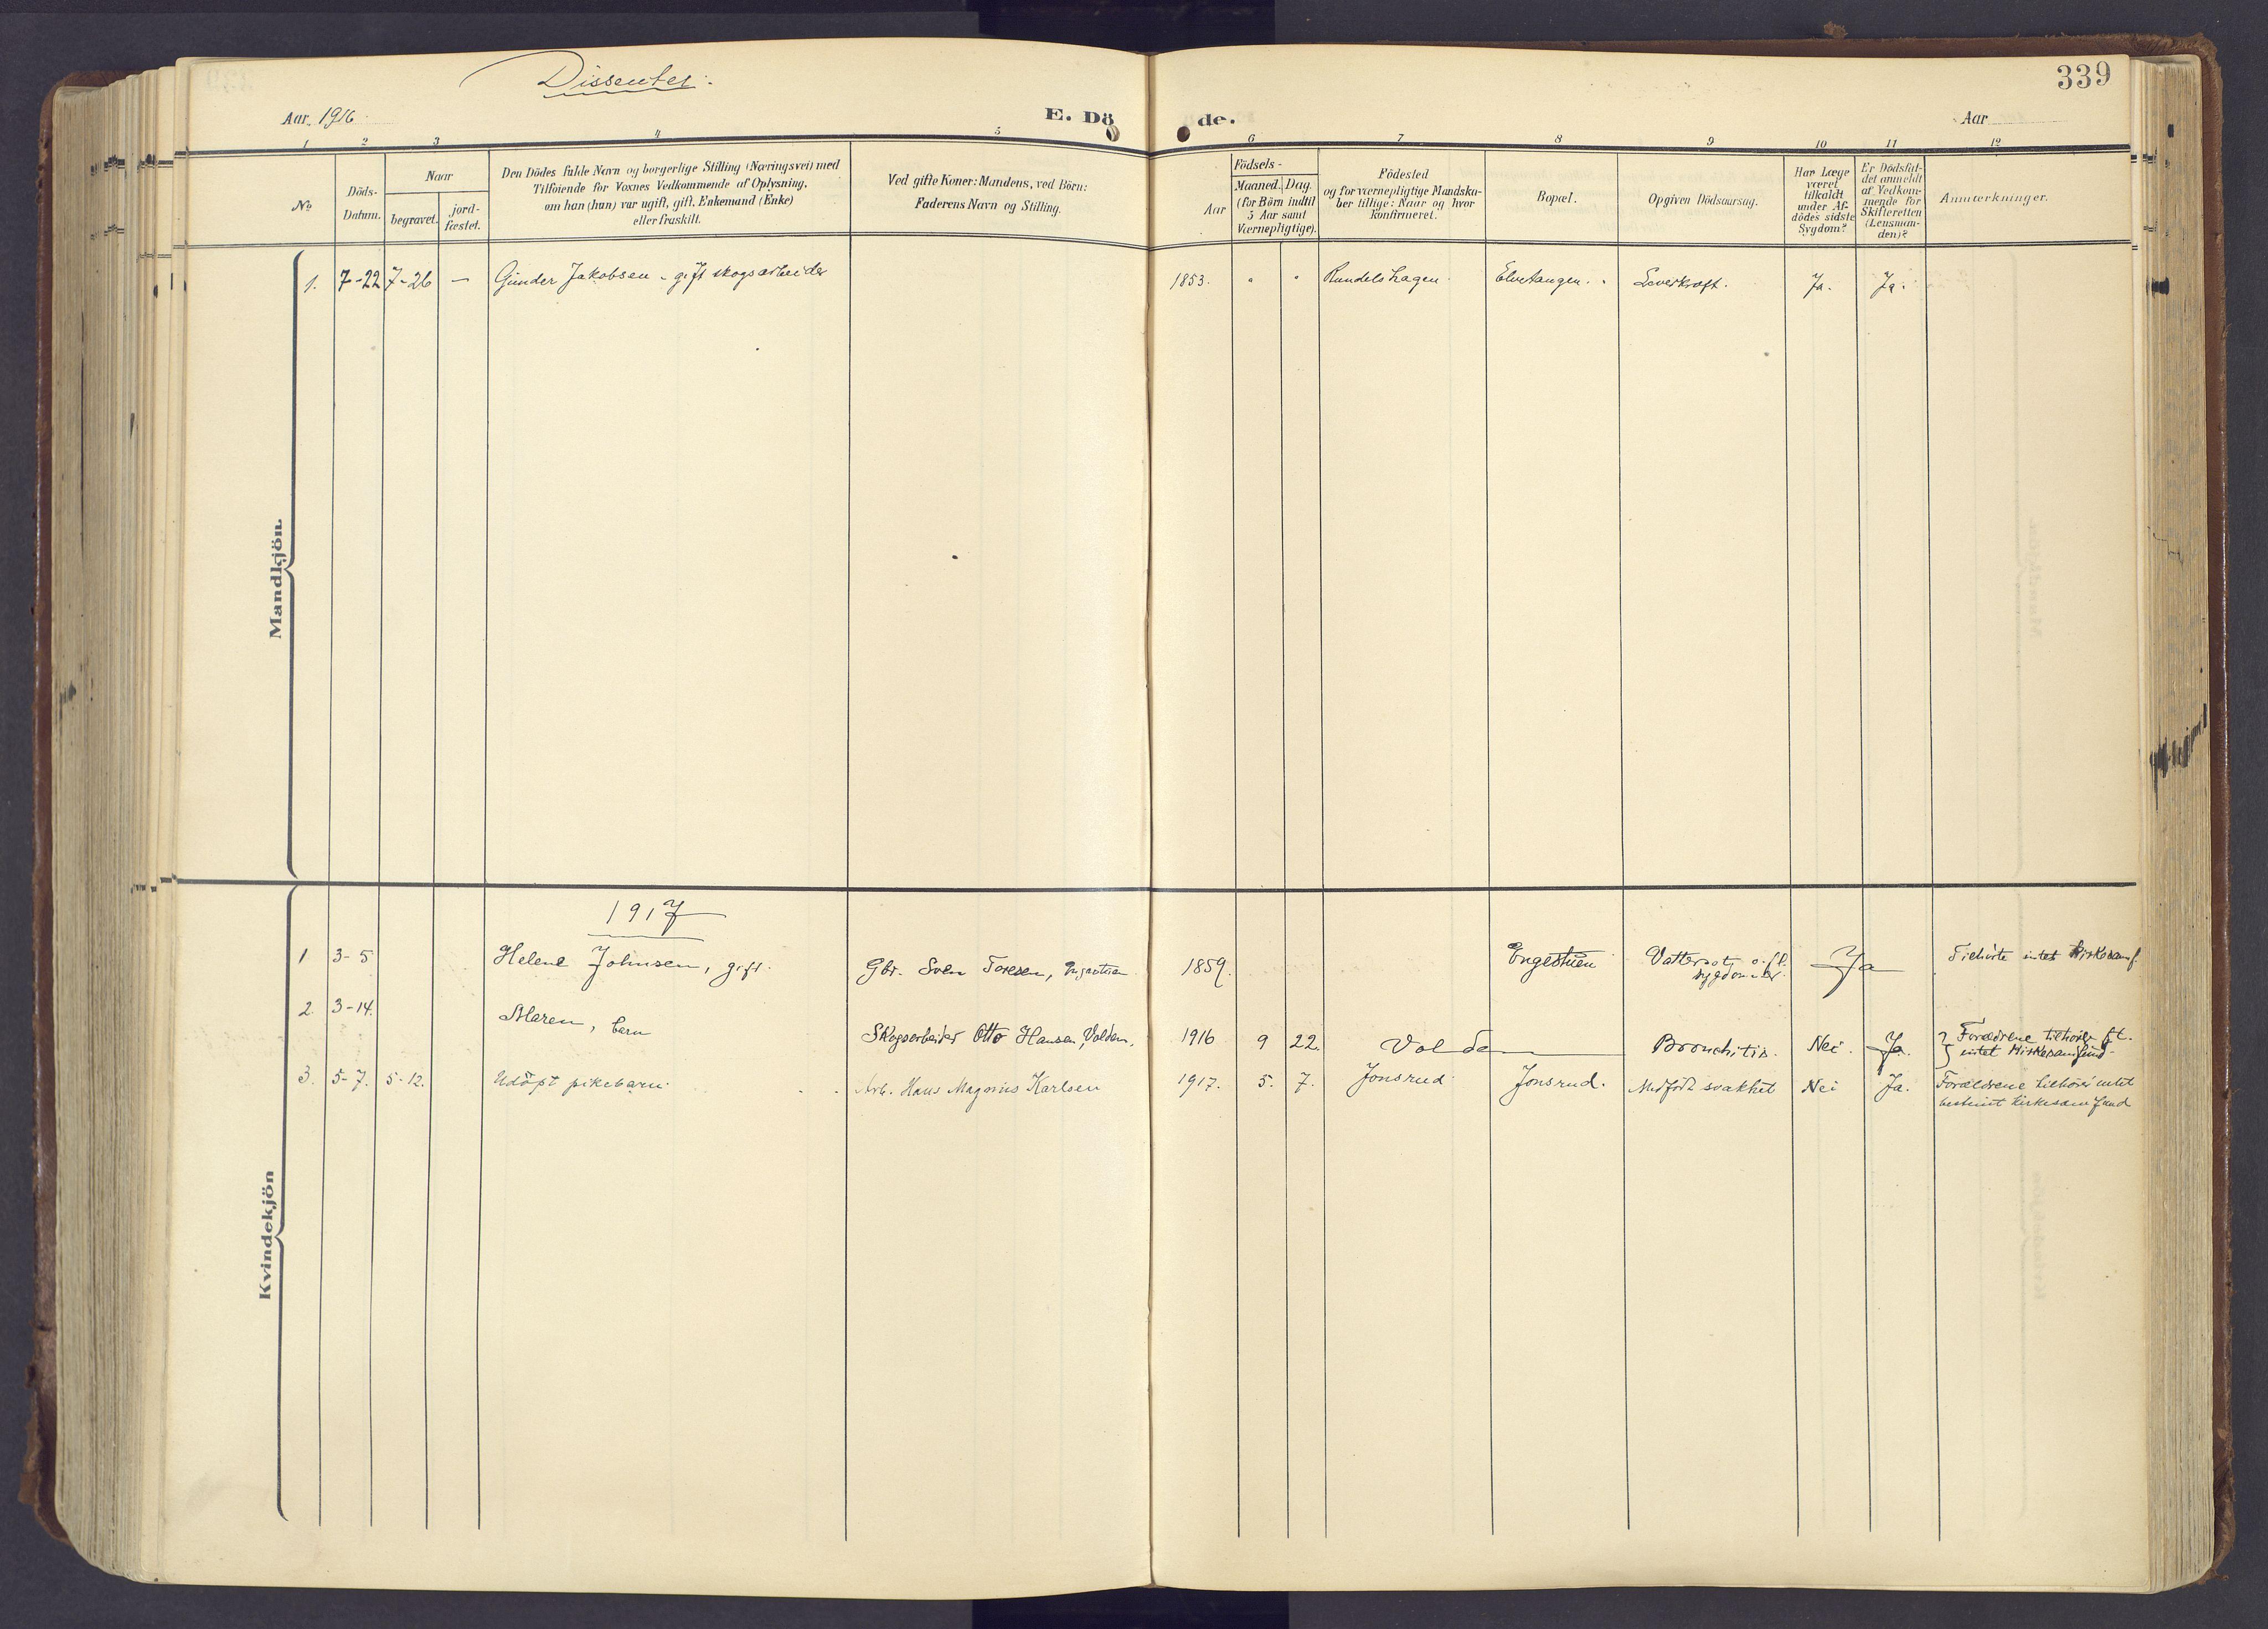 SAH, Lunner prestekontor, H/Ha/Haa/L0001: Ministerialbok nr. 1, 1907-1922, s. 339